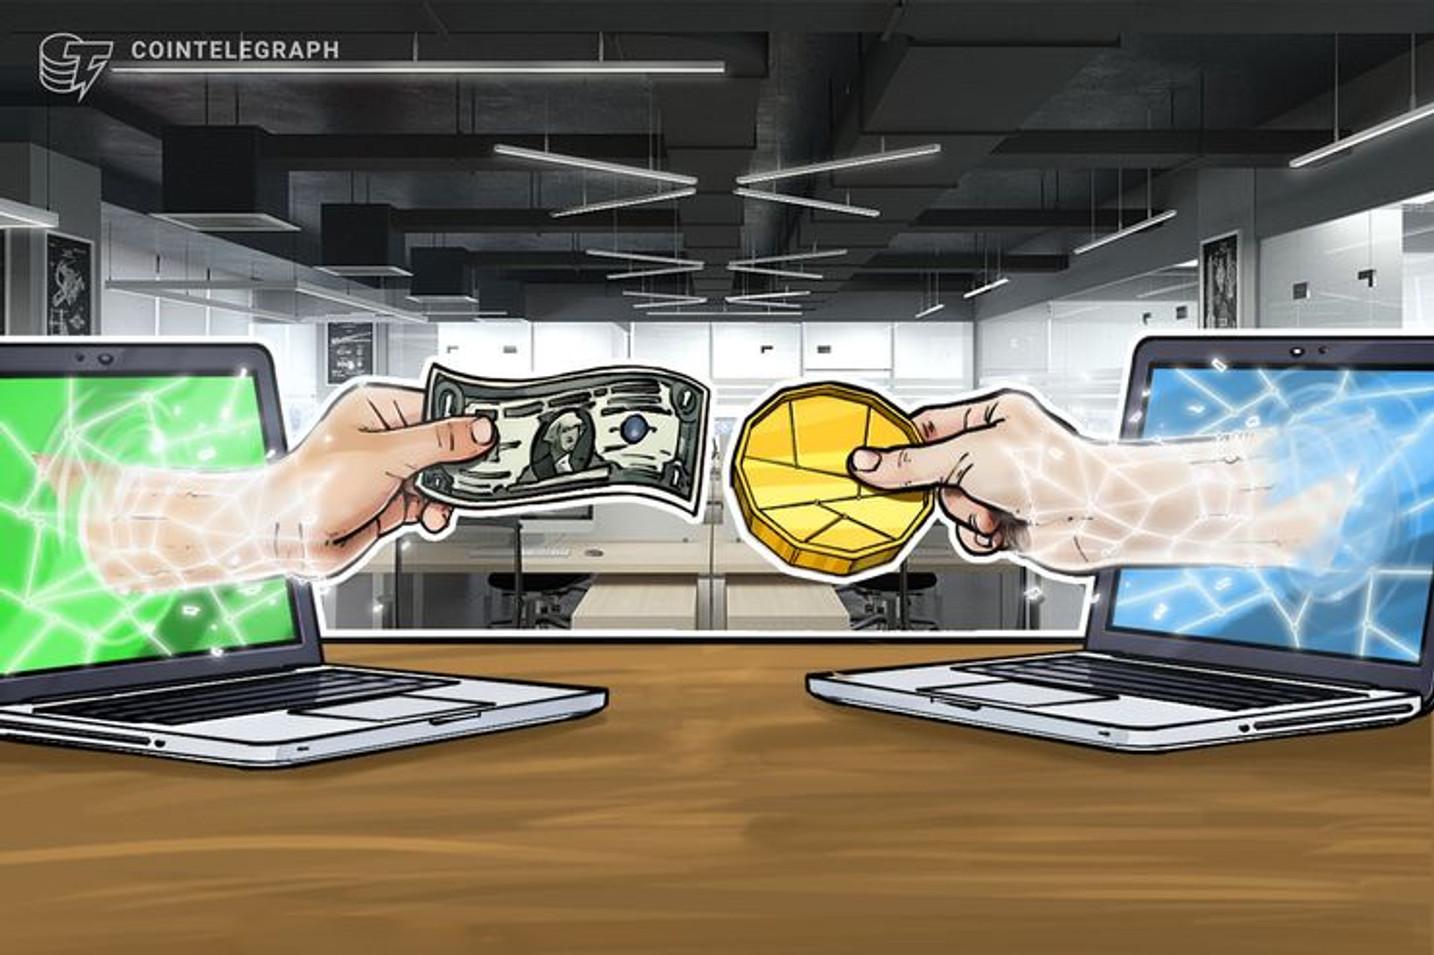 CEO do Banco Inter diz ser 'pouco factível' que big techs como o Facebook protagonizem sistemas de pagamento no futuro breve